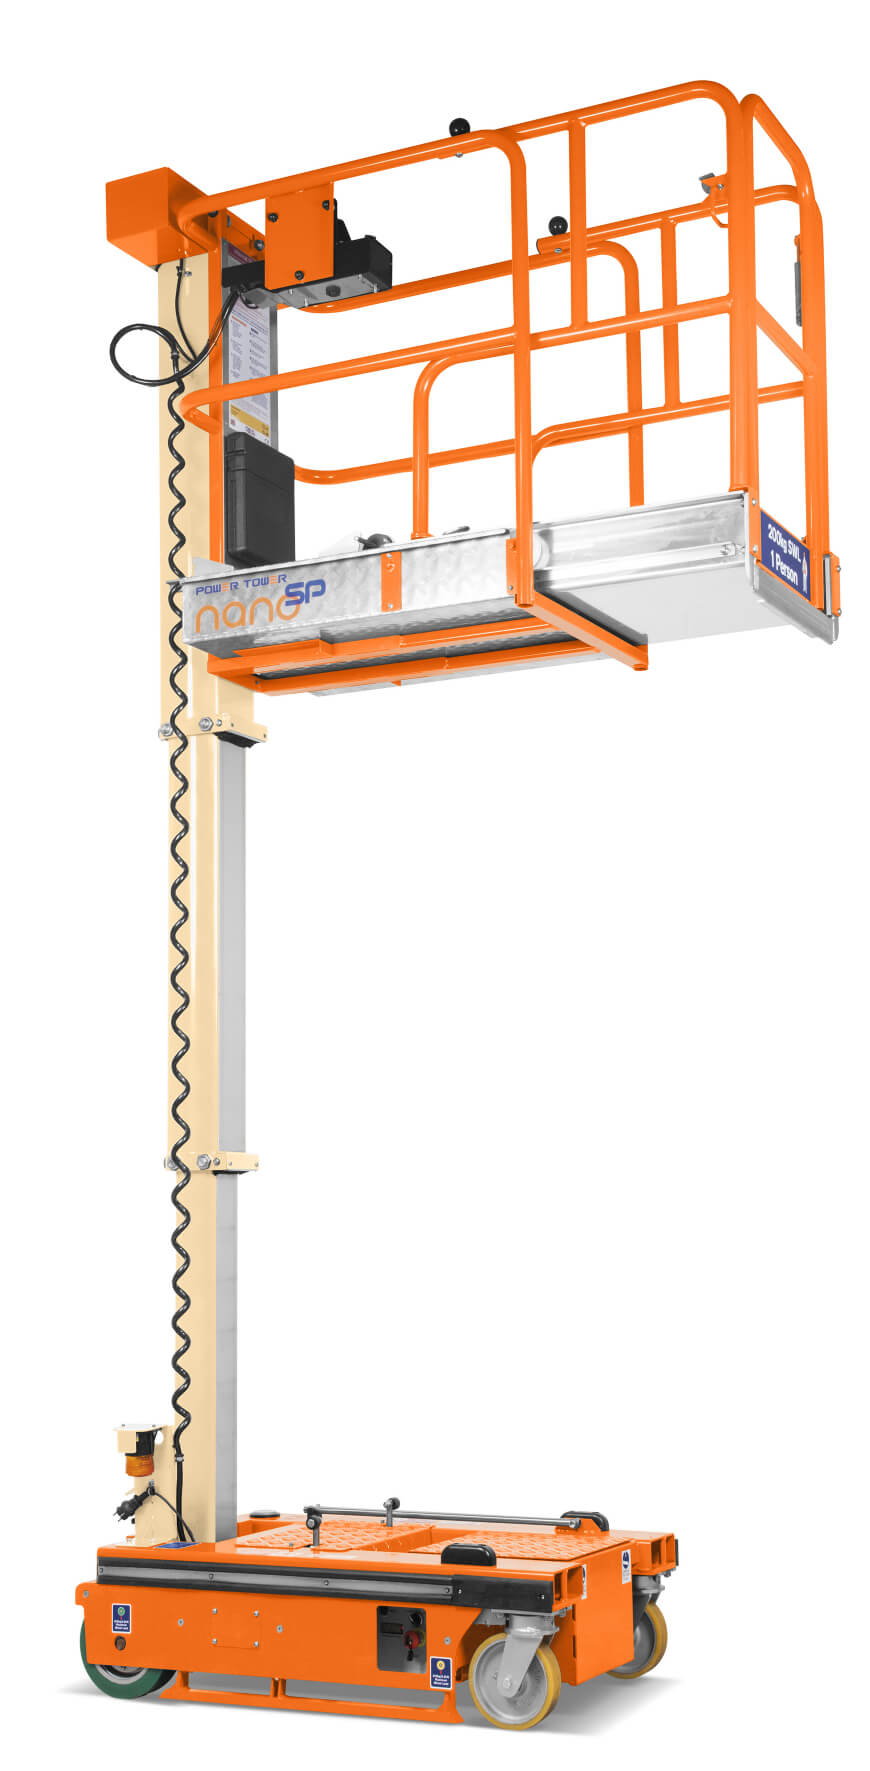 Vertical Lift Rental | Vertical Lift for Rent | Aerial Work Platform